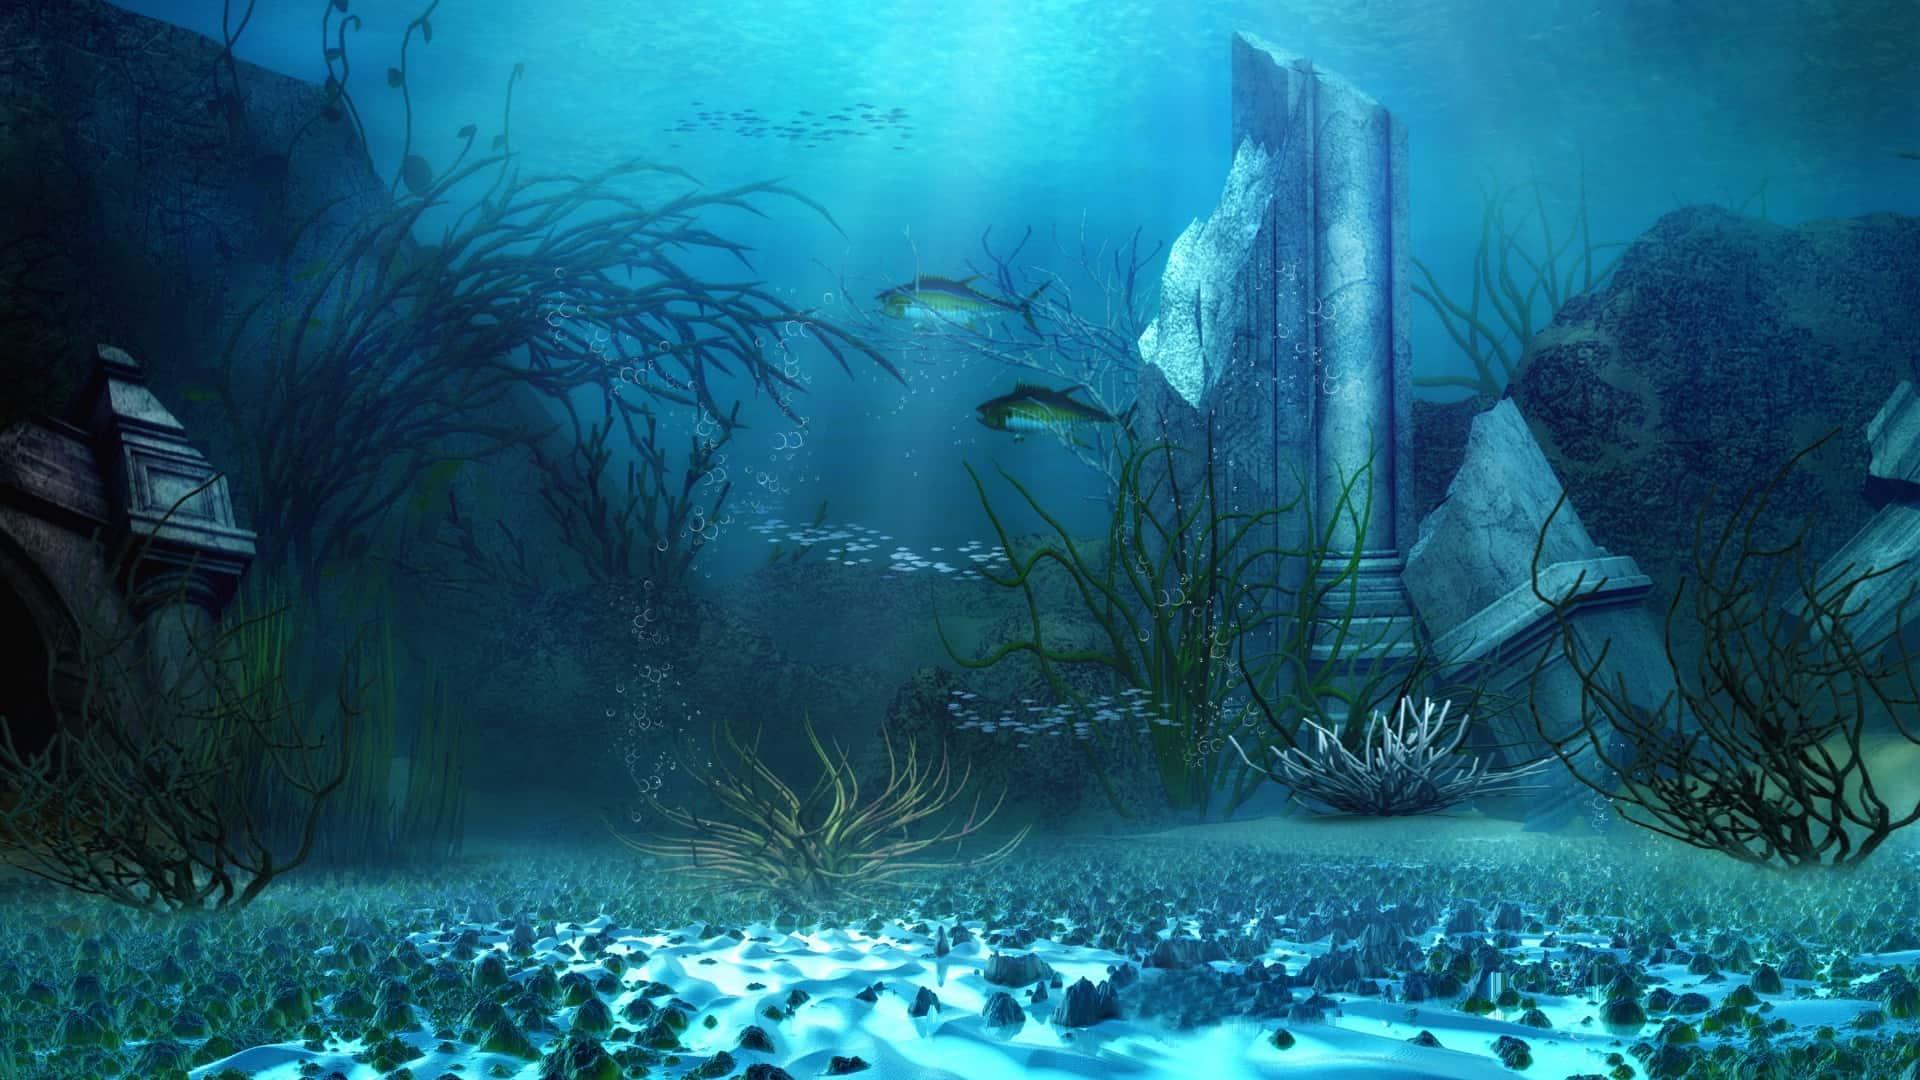 Ocean Game - Underwater Adventure Game Sound Effects Library